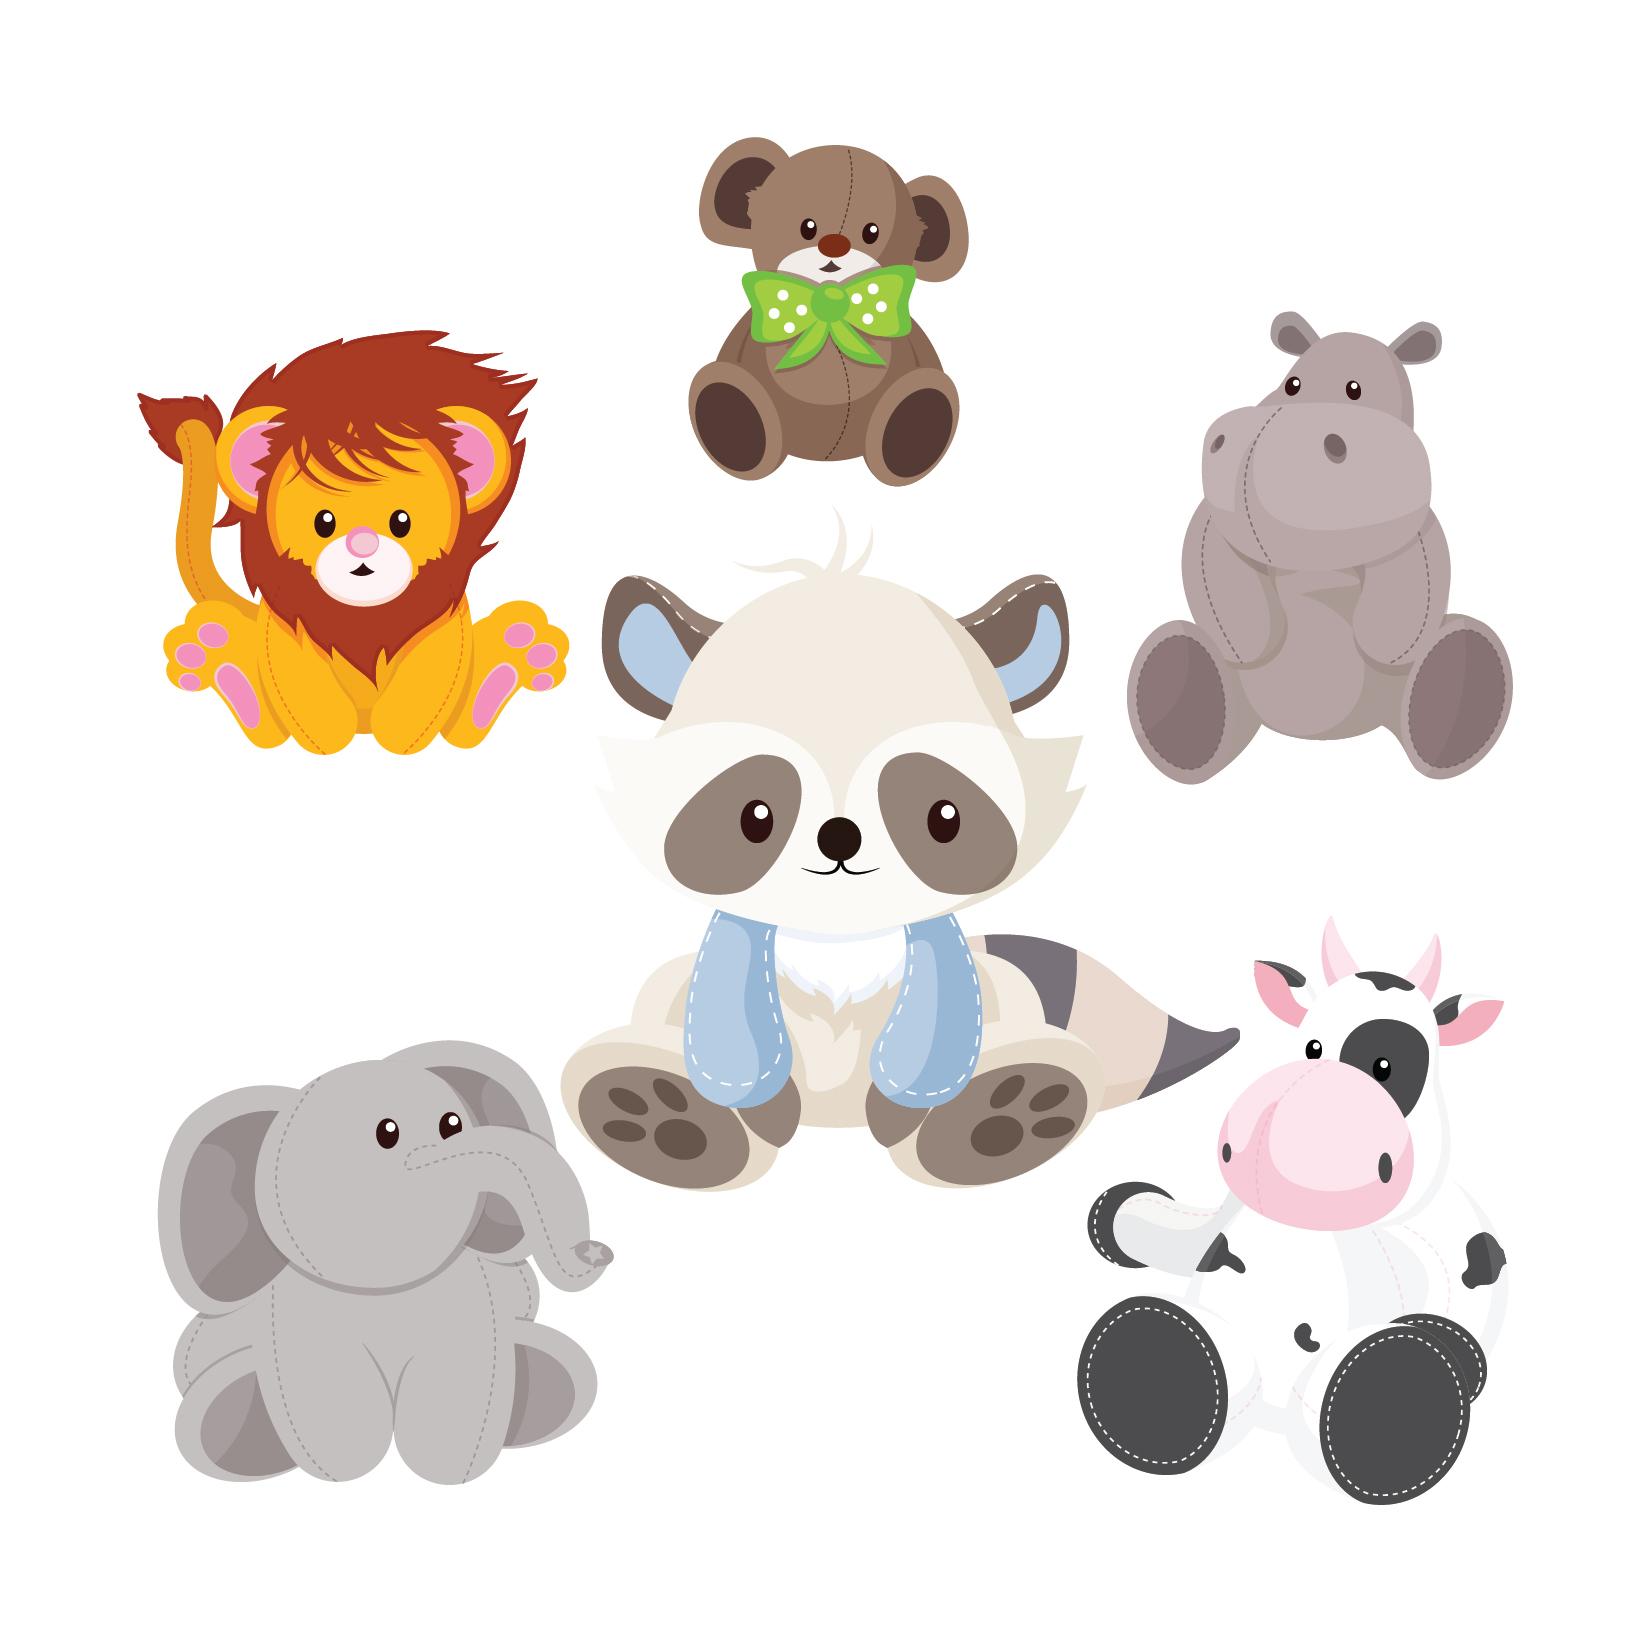 Soft Toys Clip Art : Plush toys clipart clipground